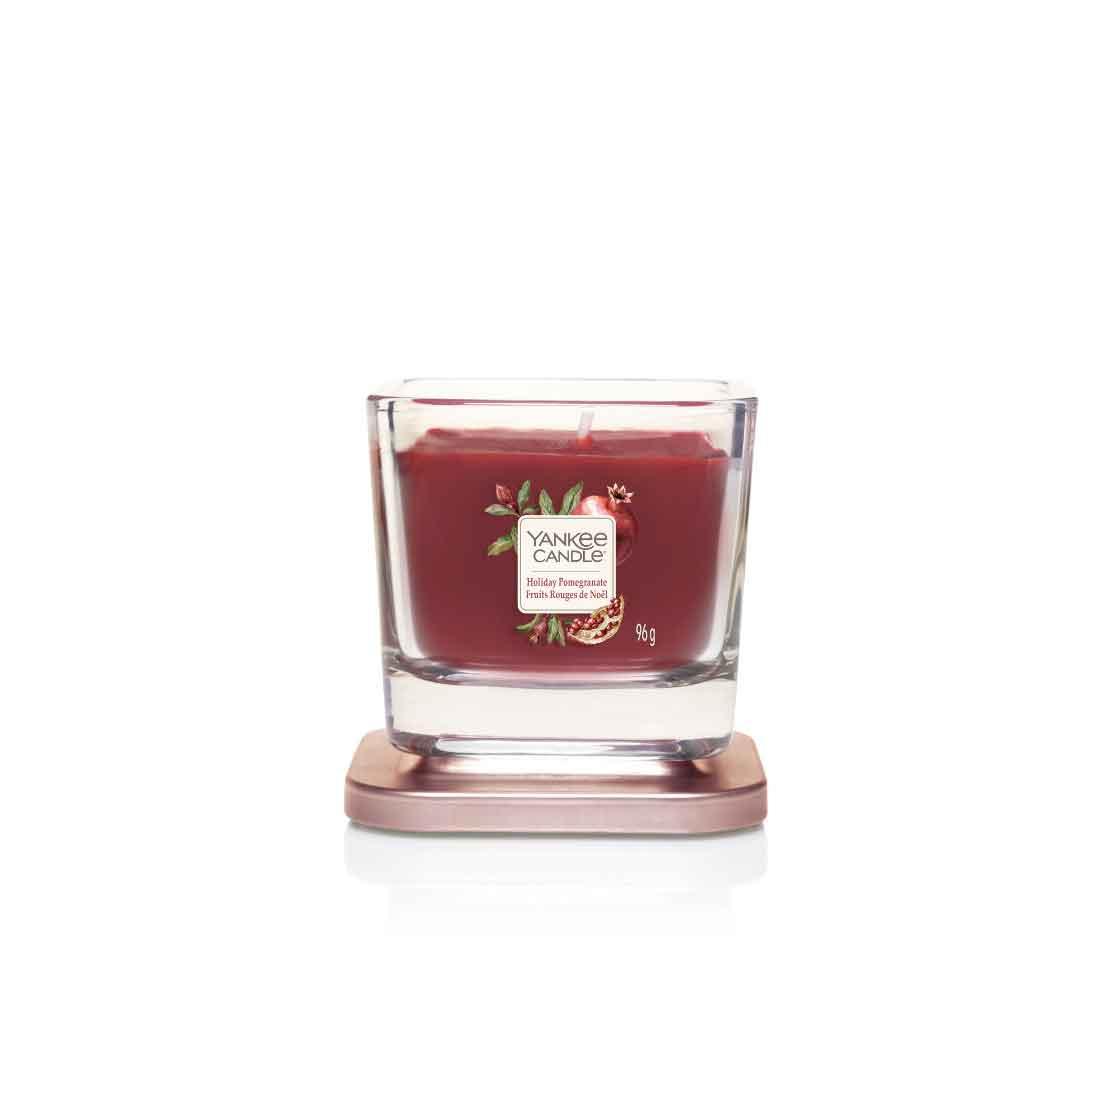 Yankee Candle Holiday Pomegranate Giara Piccola